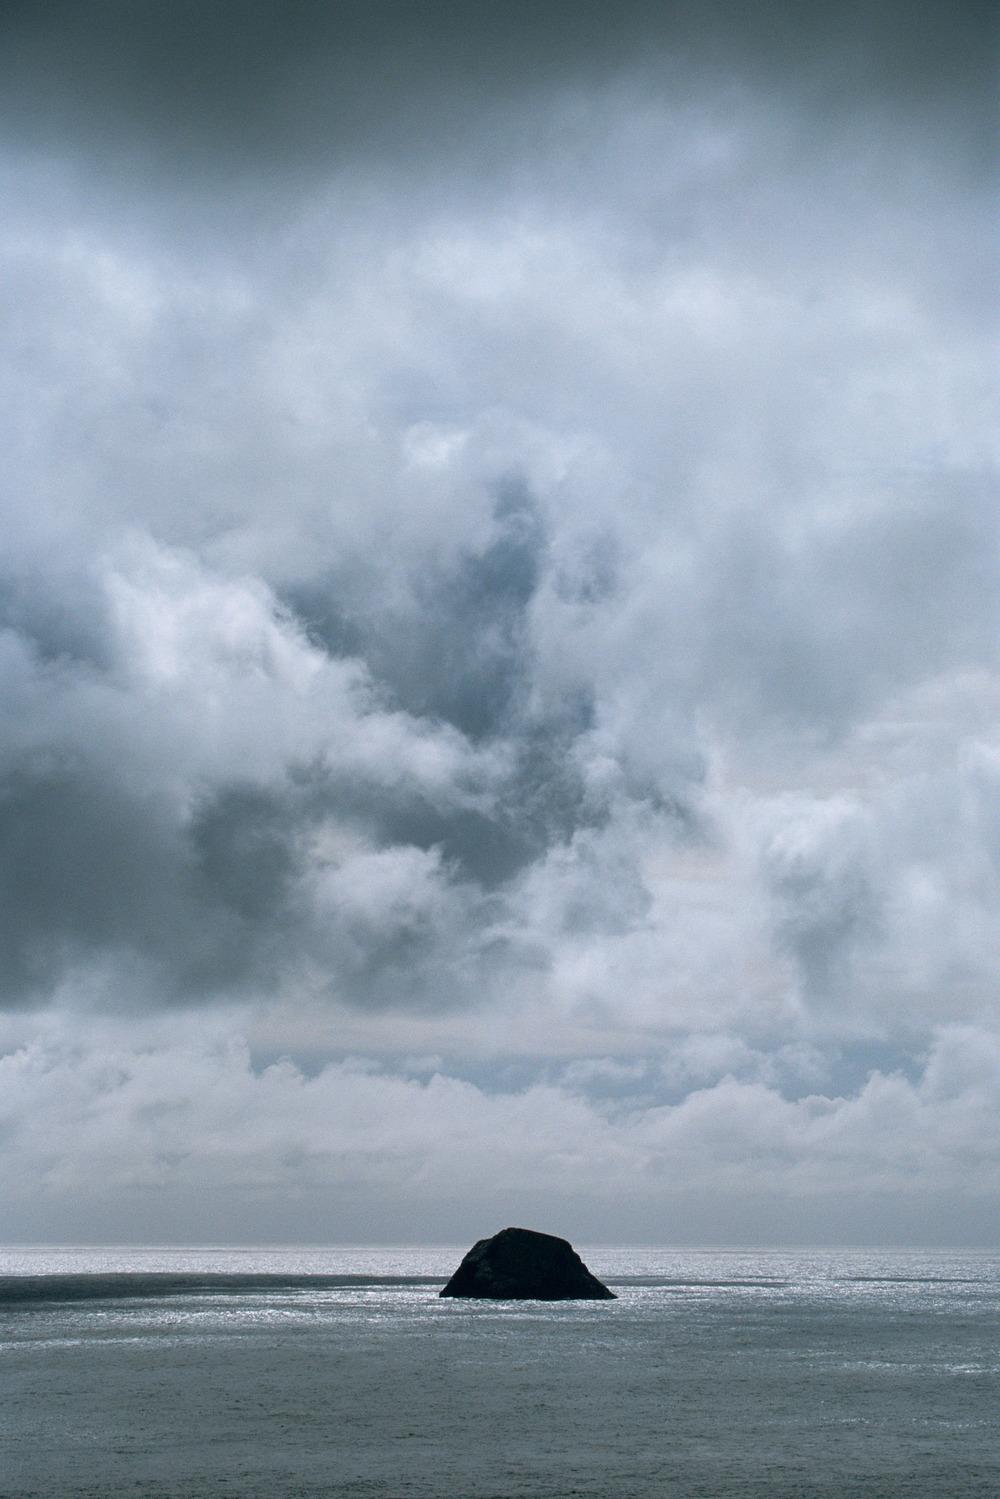 Levenish under storm cloud, St Kilda Archipelago, Scotland